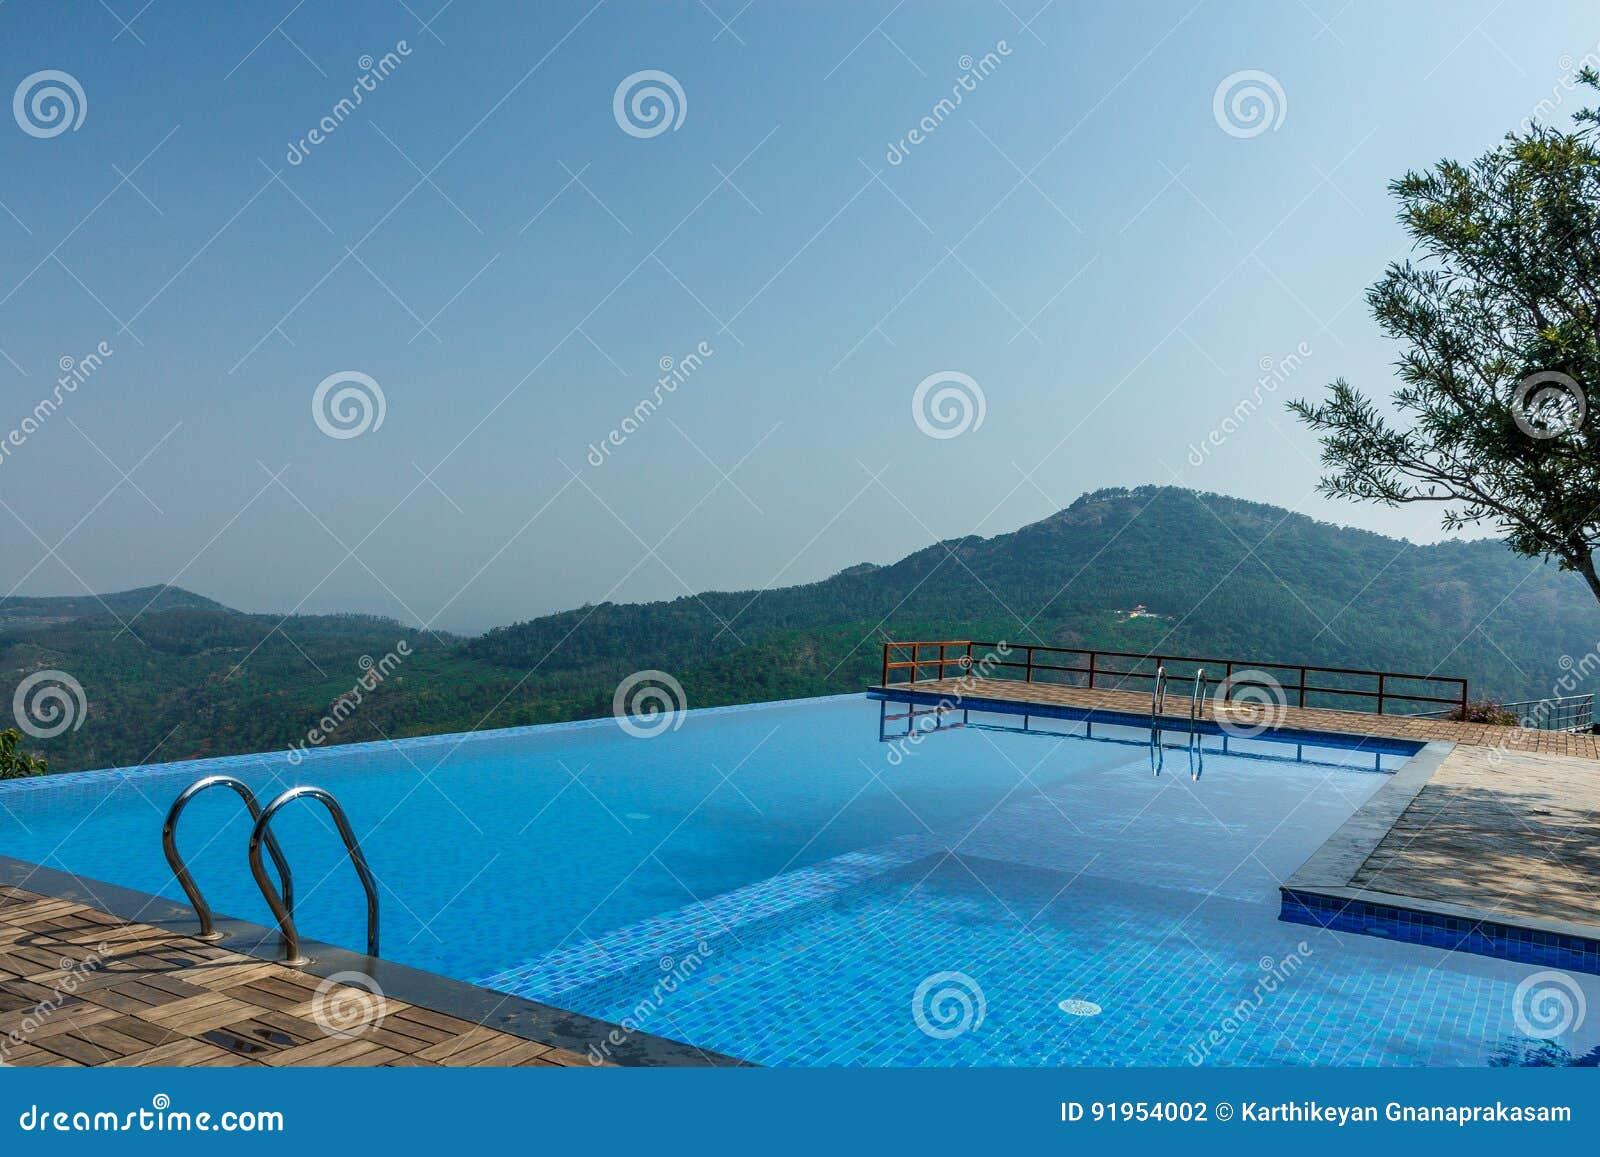 Salem, Yercaud, Indien, am 29. April 2017: Swimmingpool auf eine Hügelstation